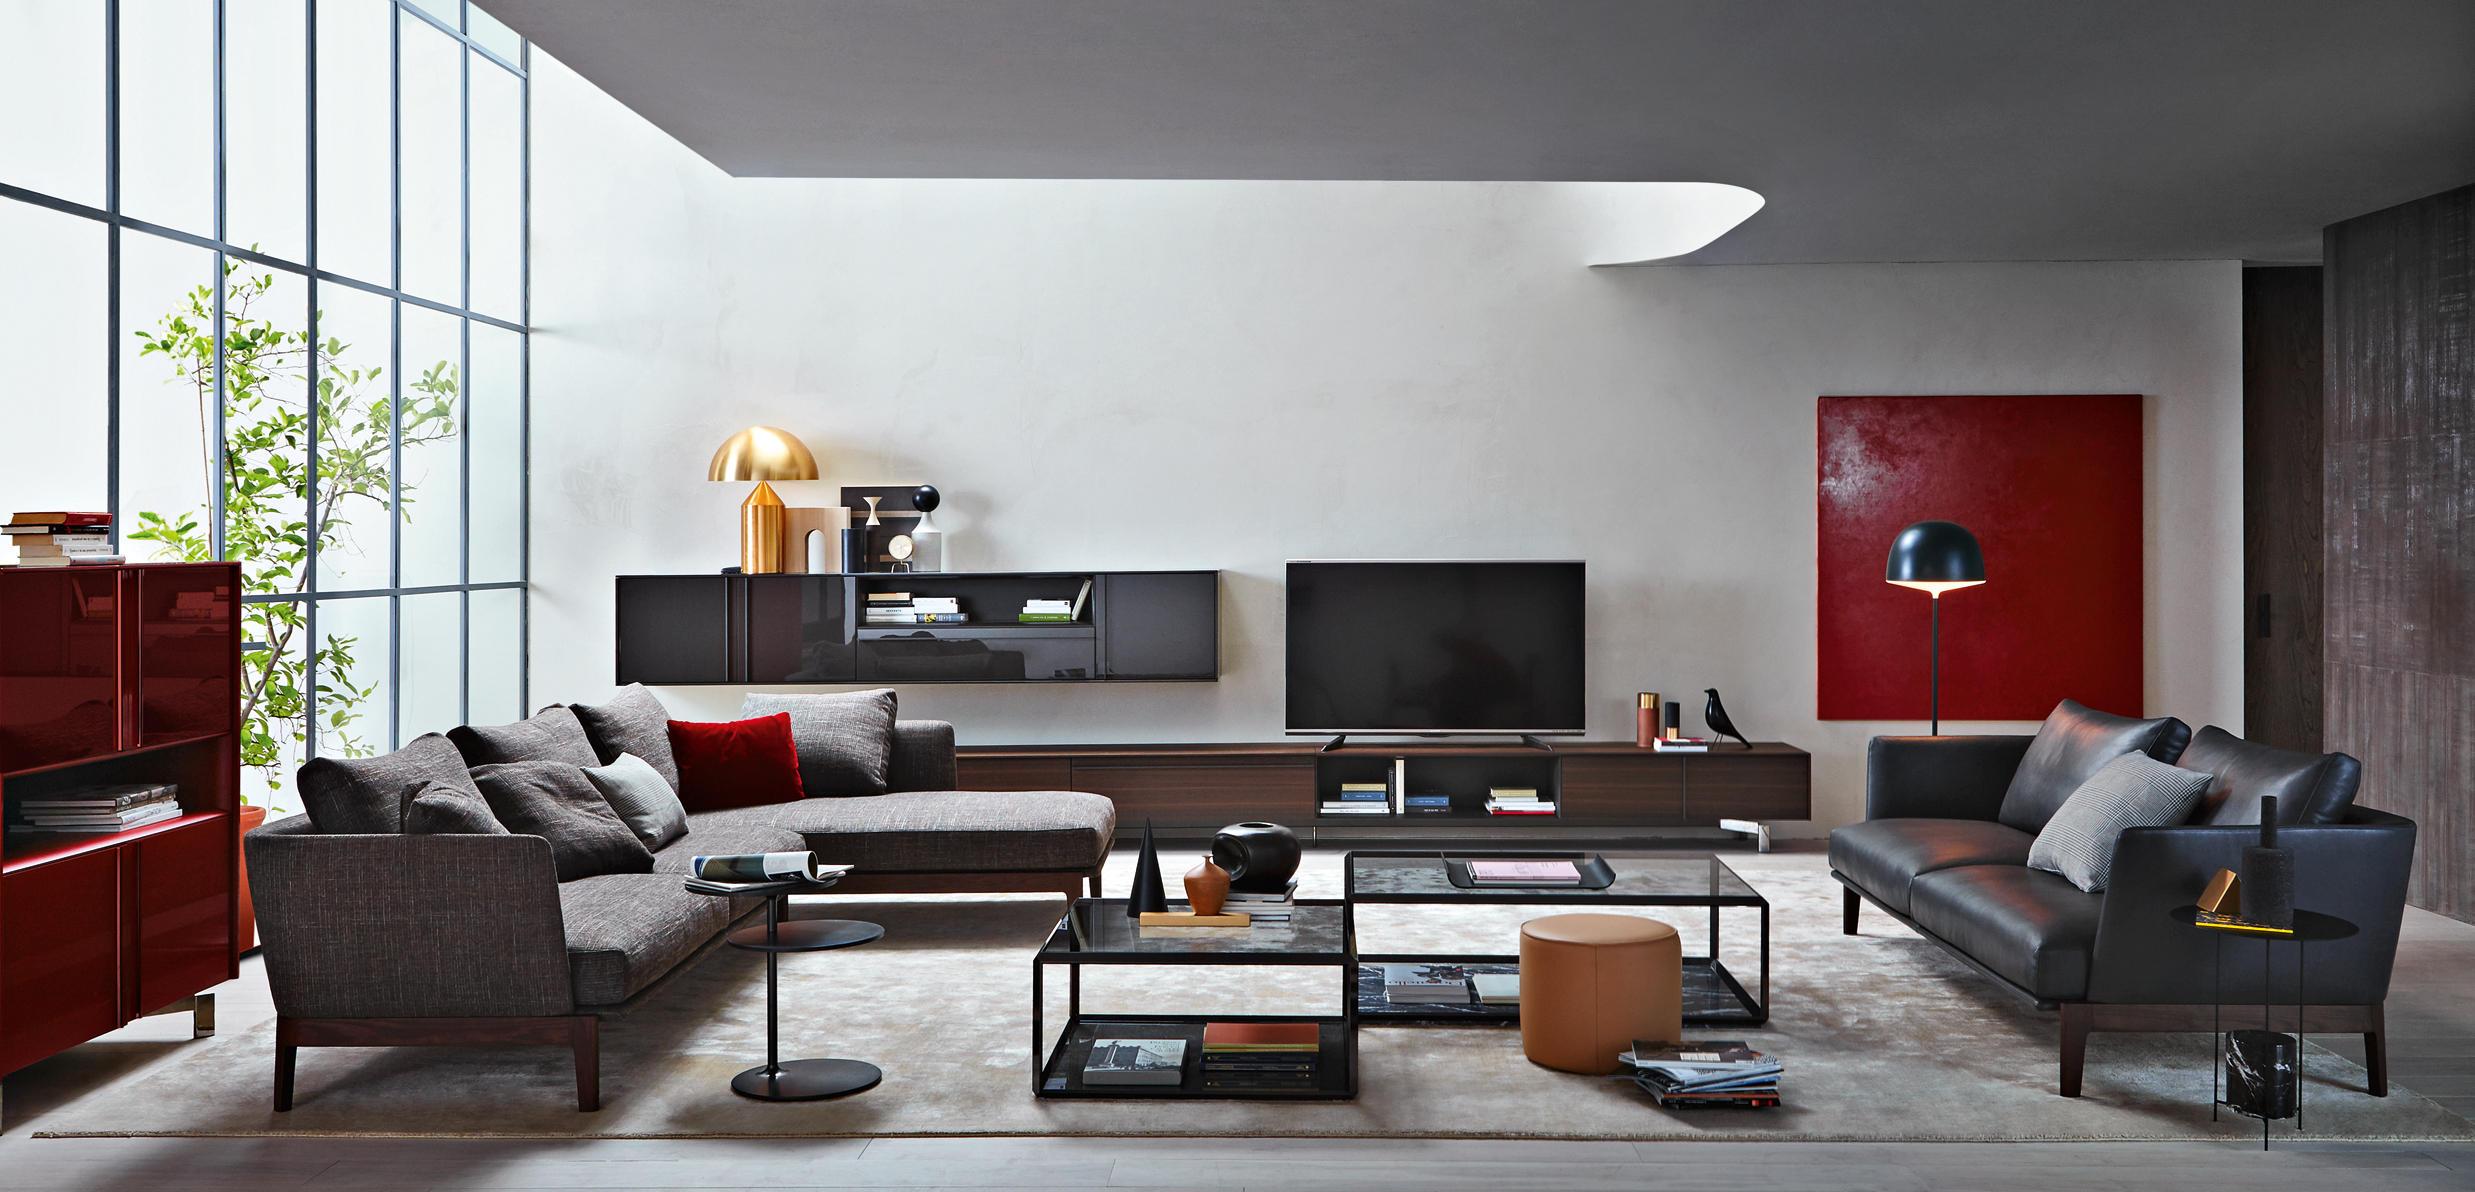 molteni c chelsea sofa. Black Bedroom Furniture Sets. Home Design Ideas